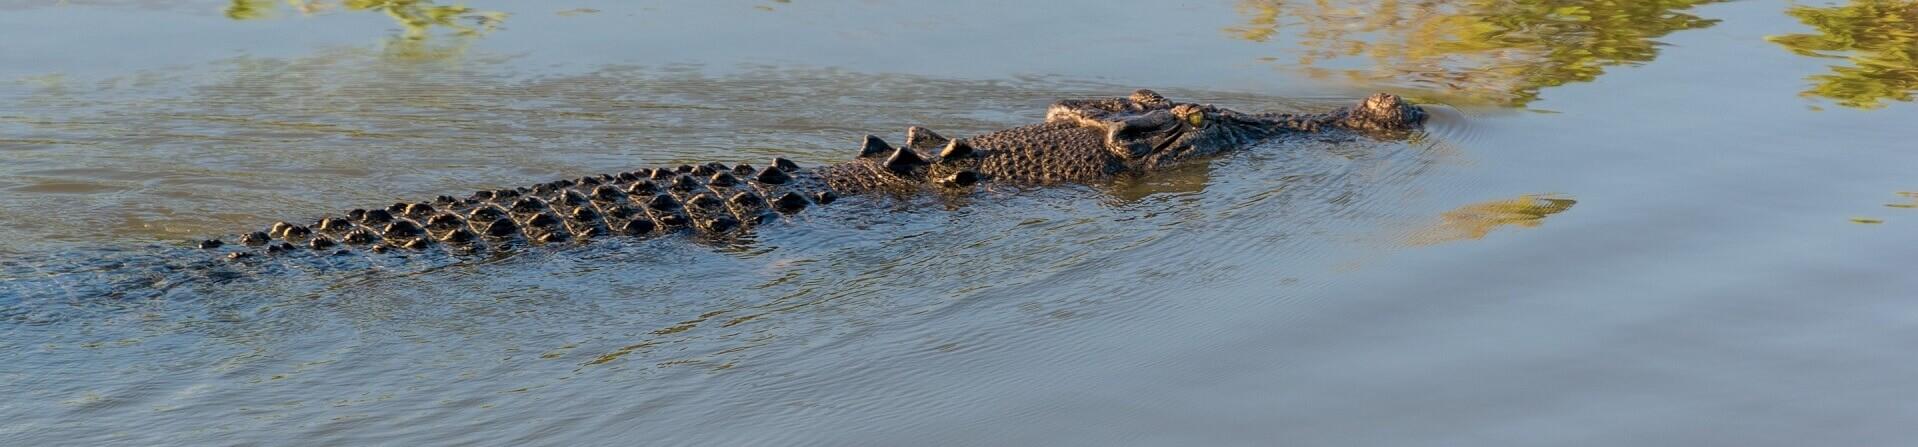 Morning Jumping Crocodile Cruise from Darwin 5